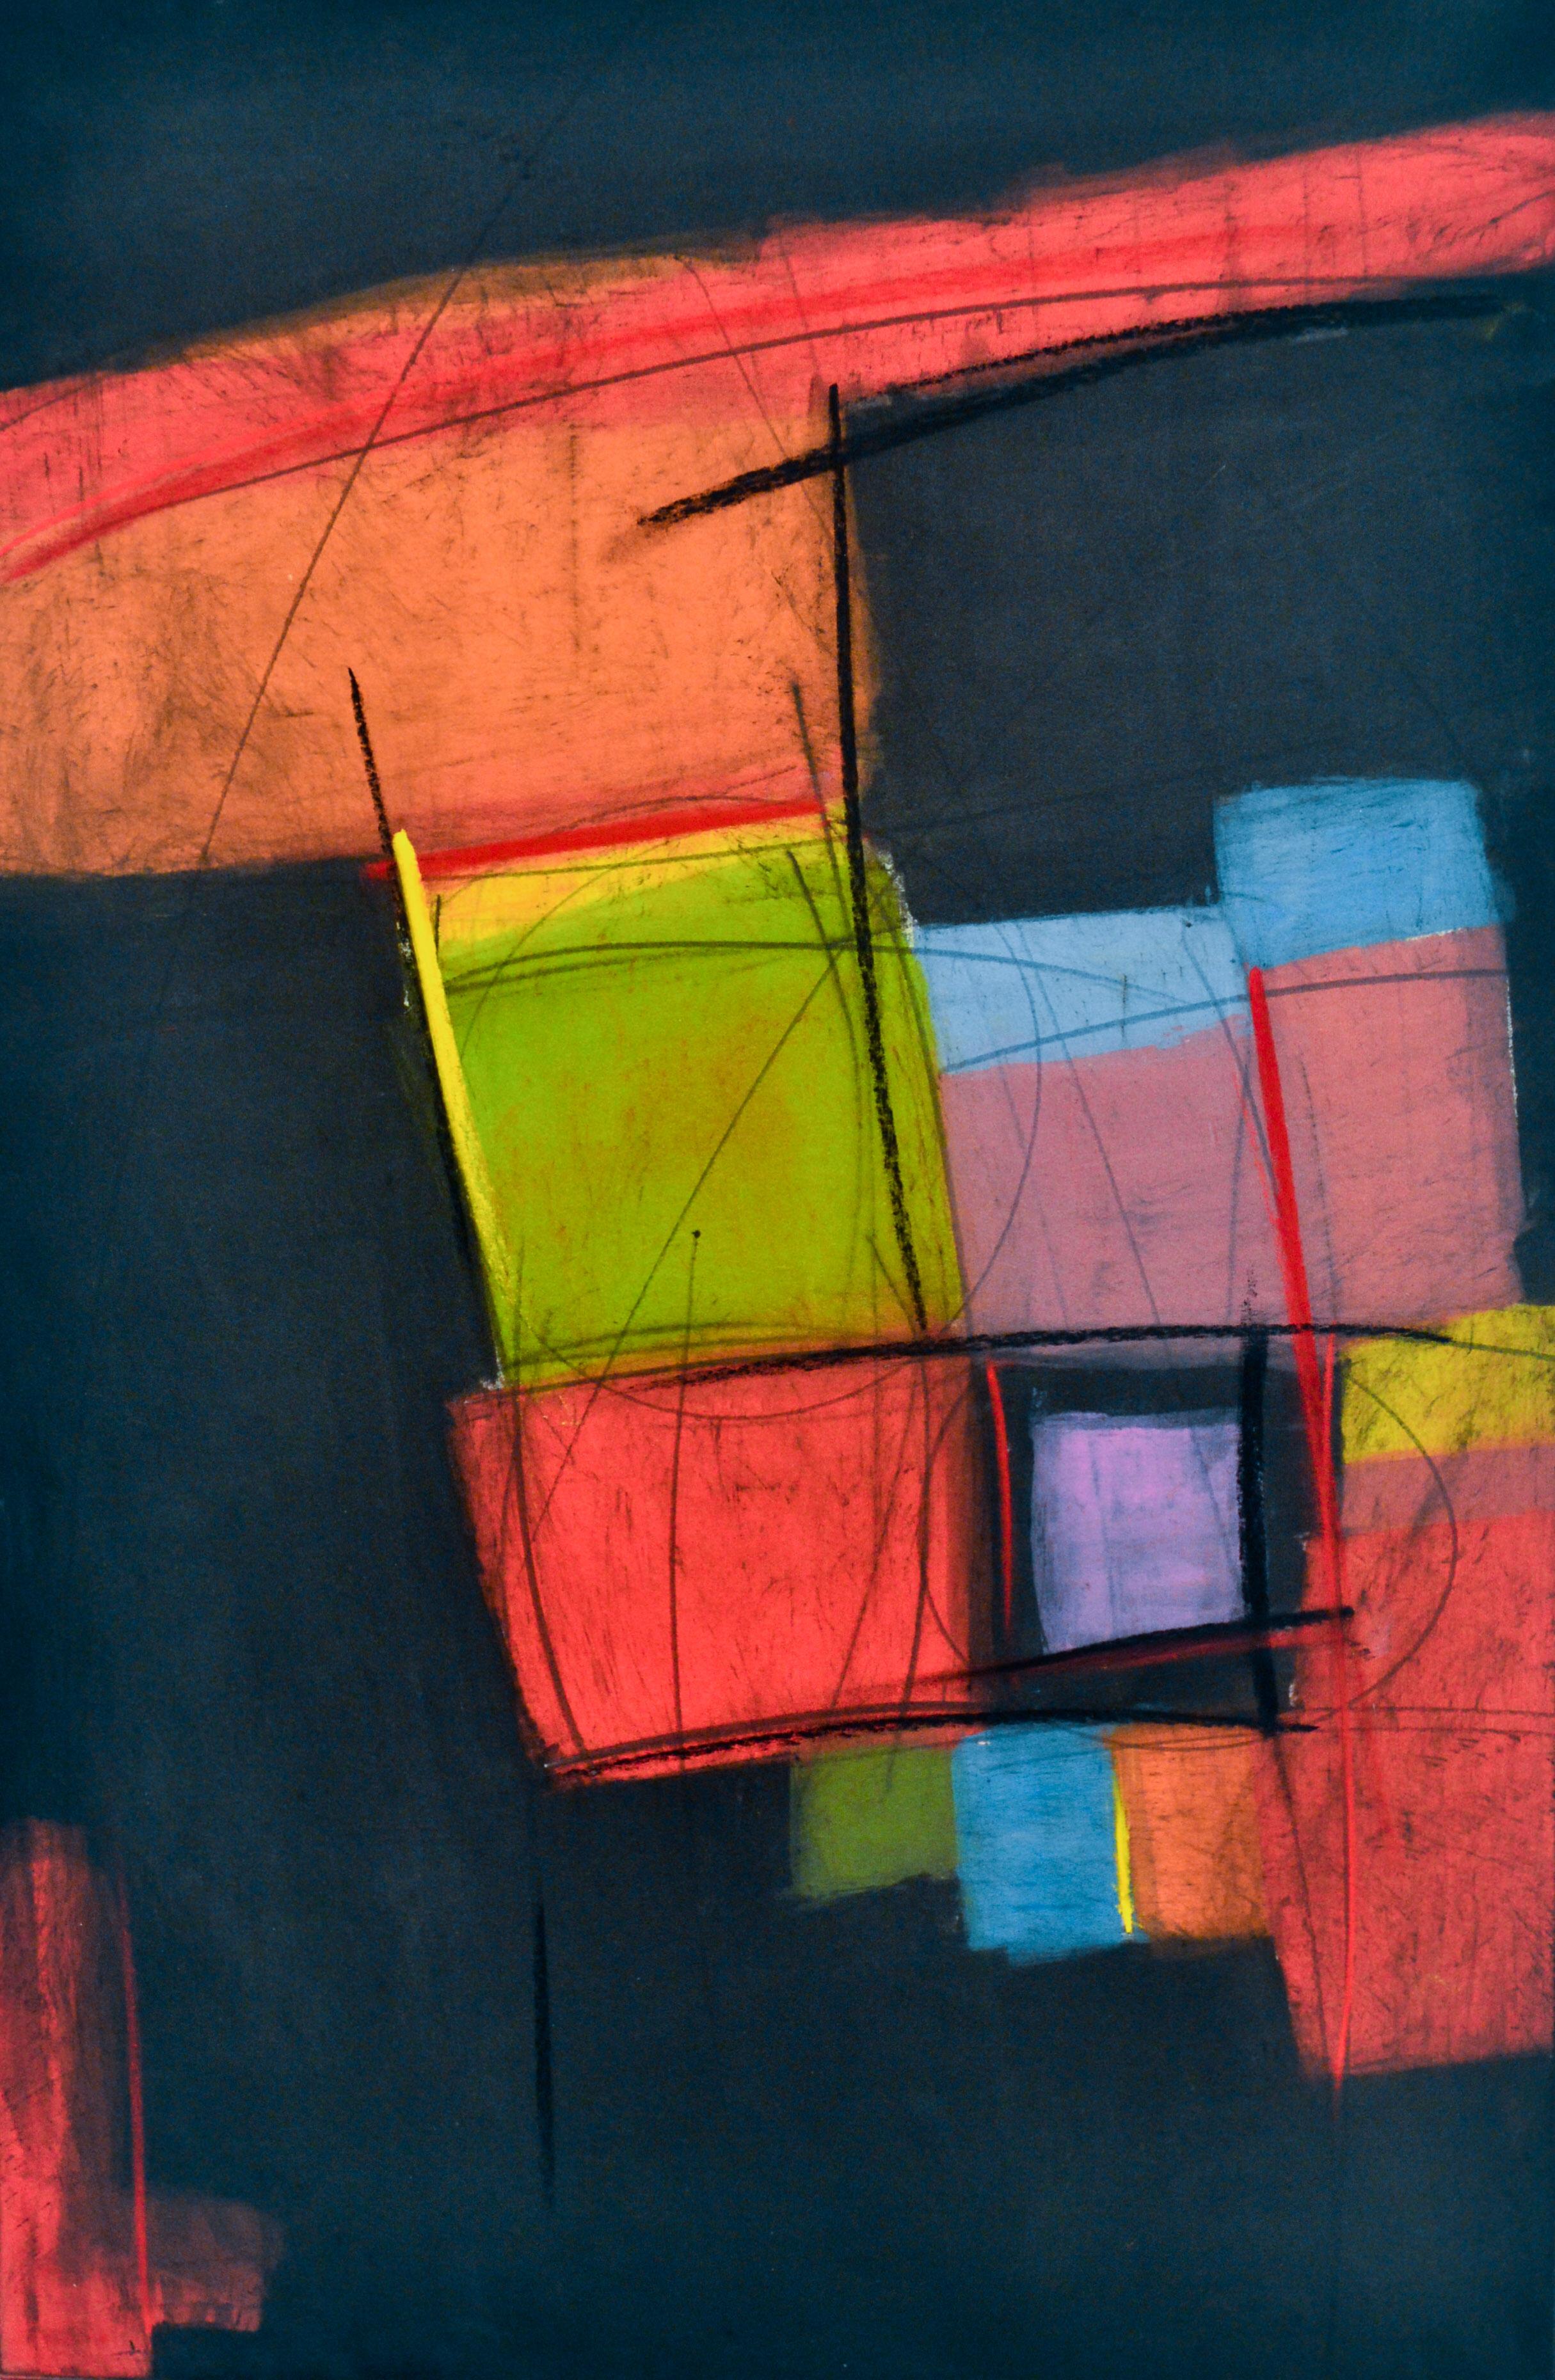 """Untitled"" No. 4, 2013"